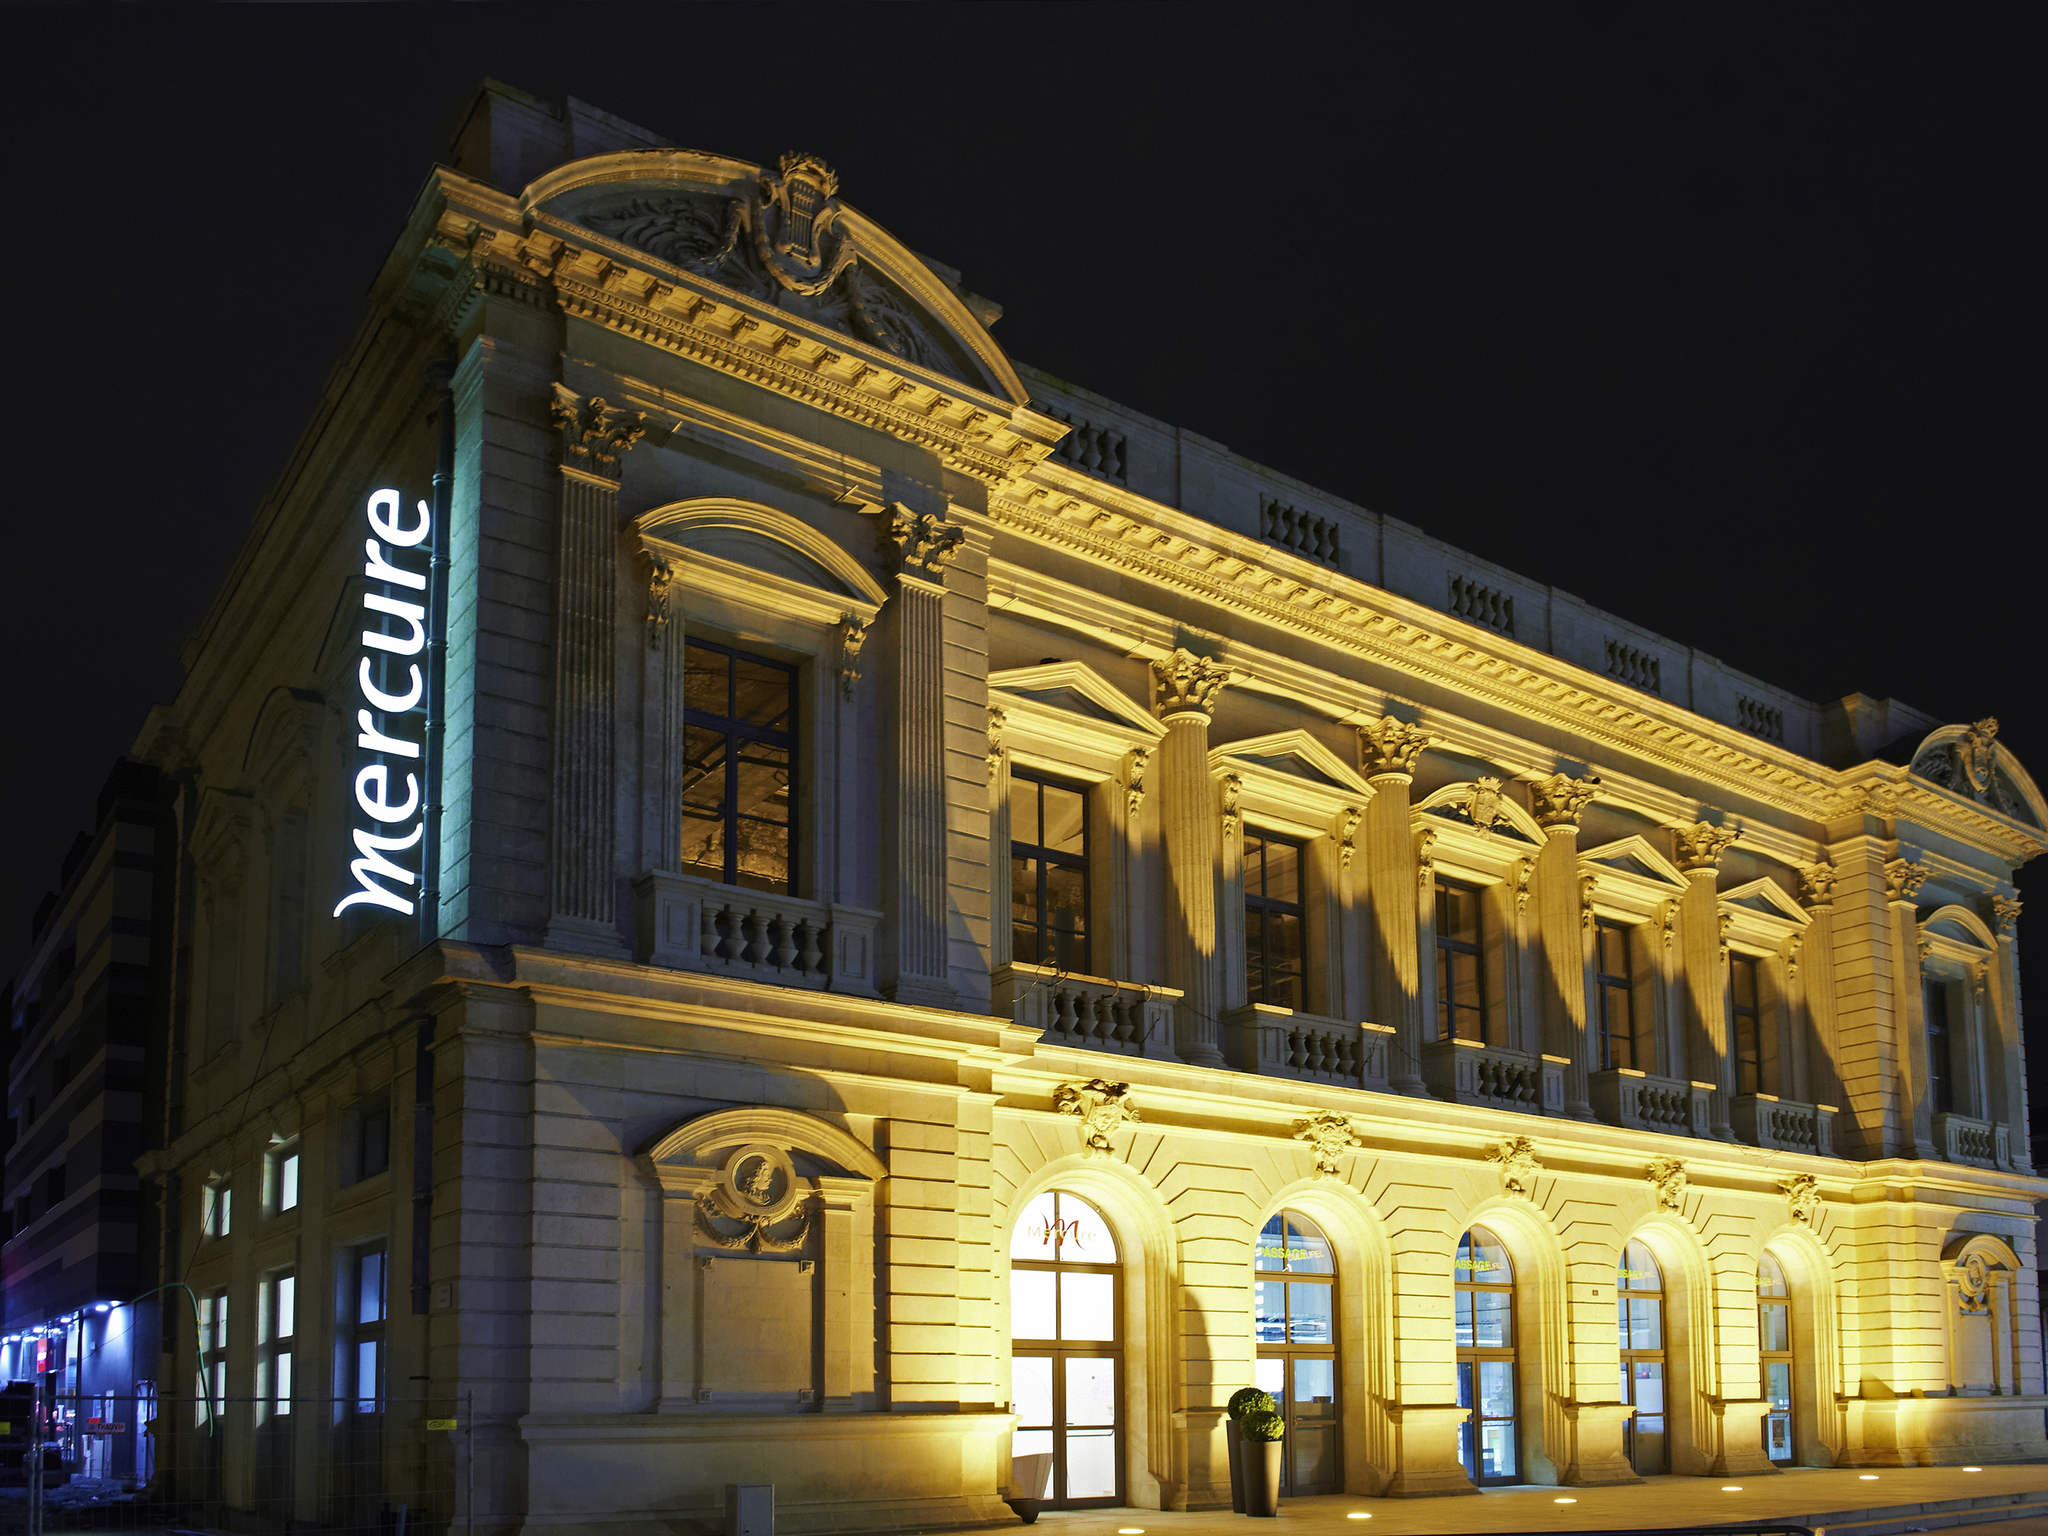 Hotel – Albergo Mercure Cholet Centre